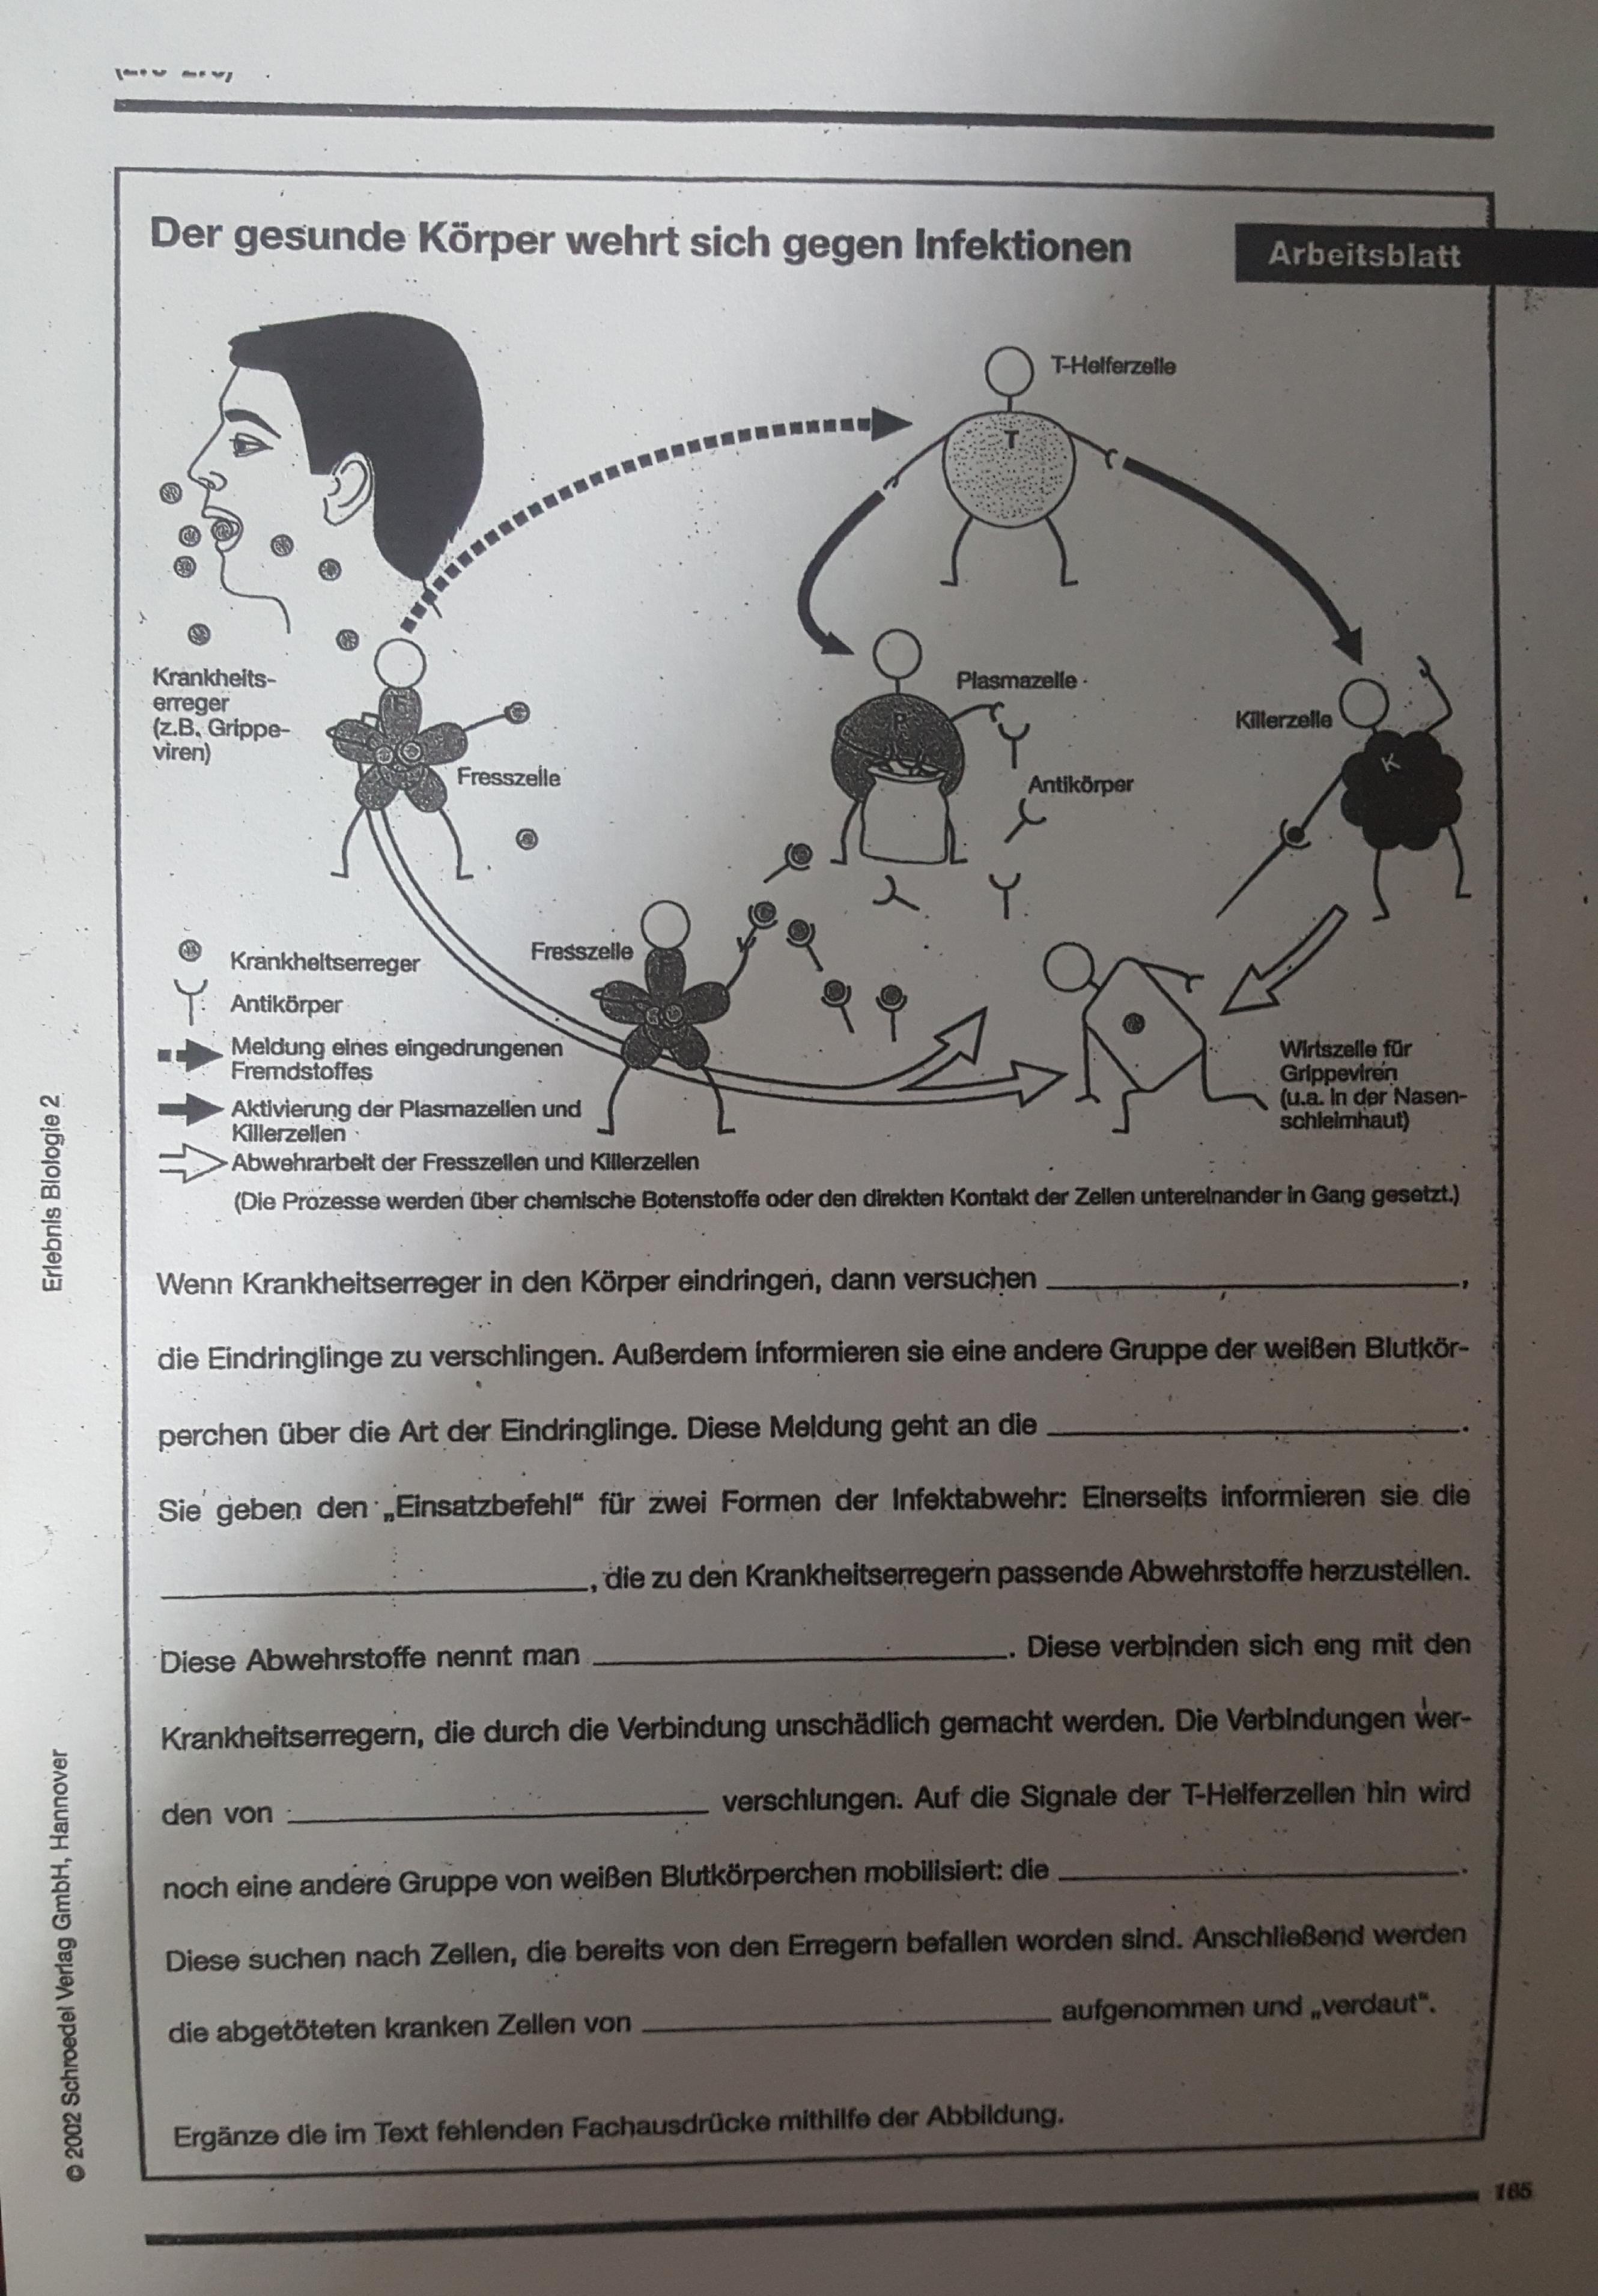 Biologie 10.Klasse) Was kommt in die Lücken? (Schule, Infektion, 10 ...